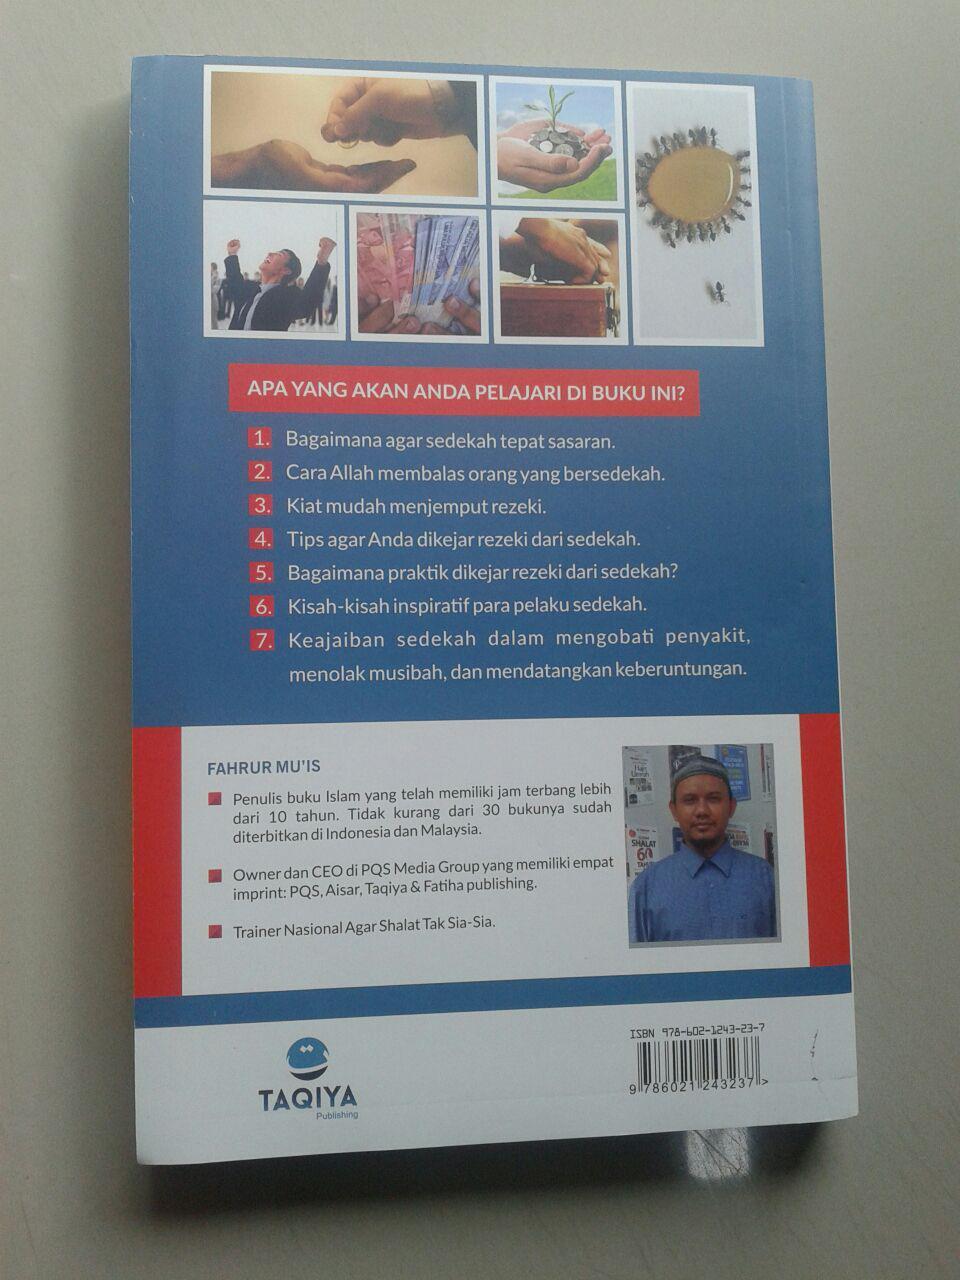 Buku Dikejar Rezeki Dari Sedekah cover 2